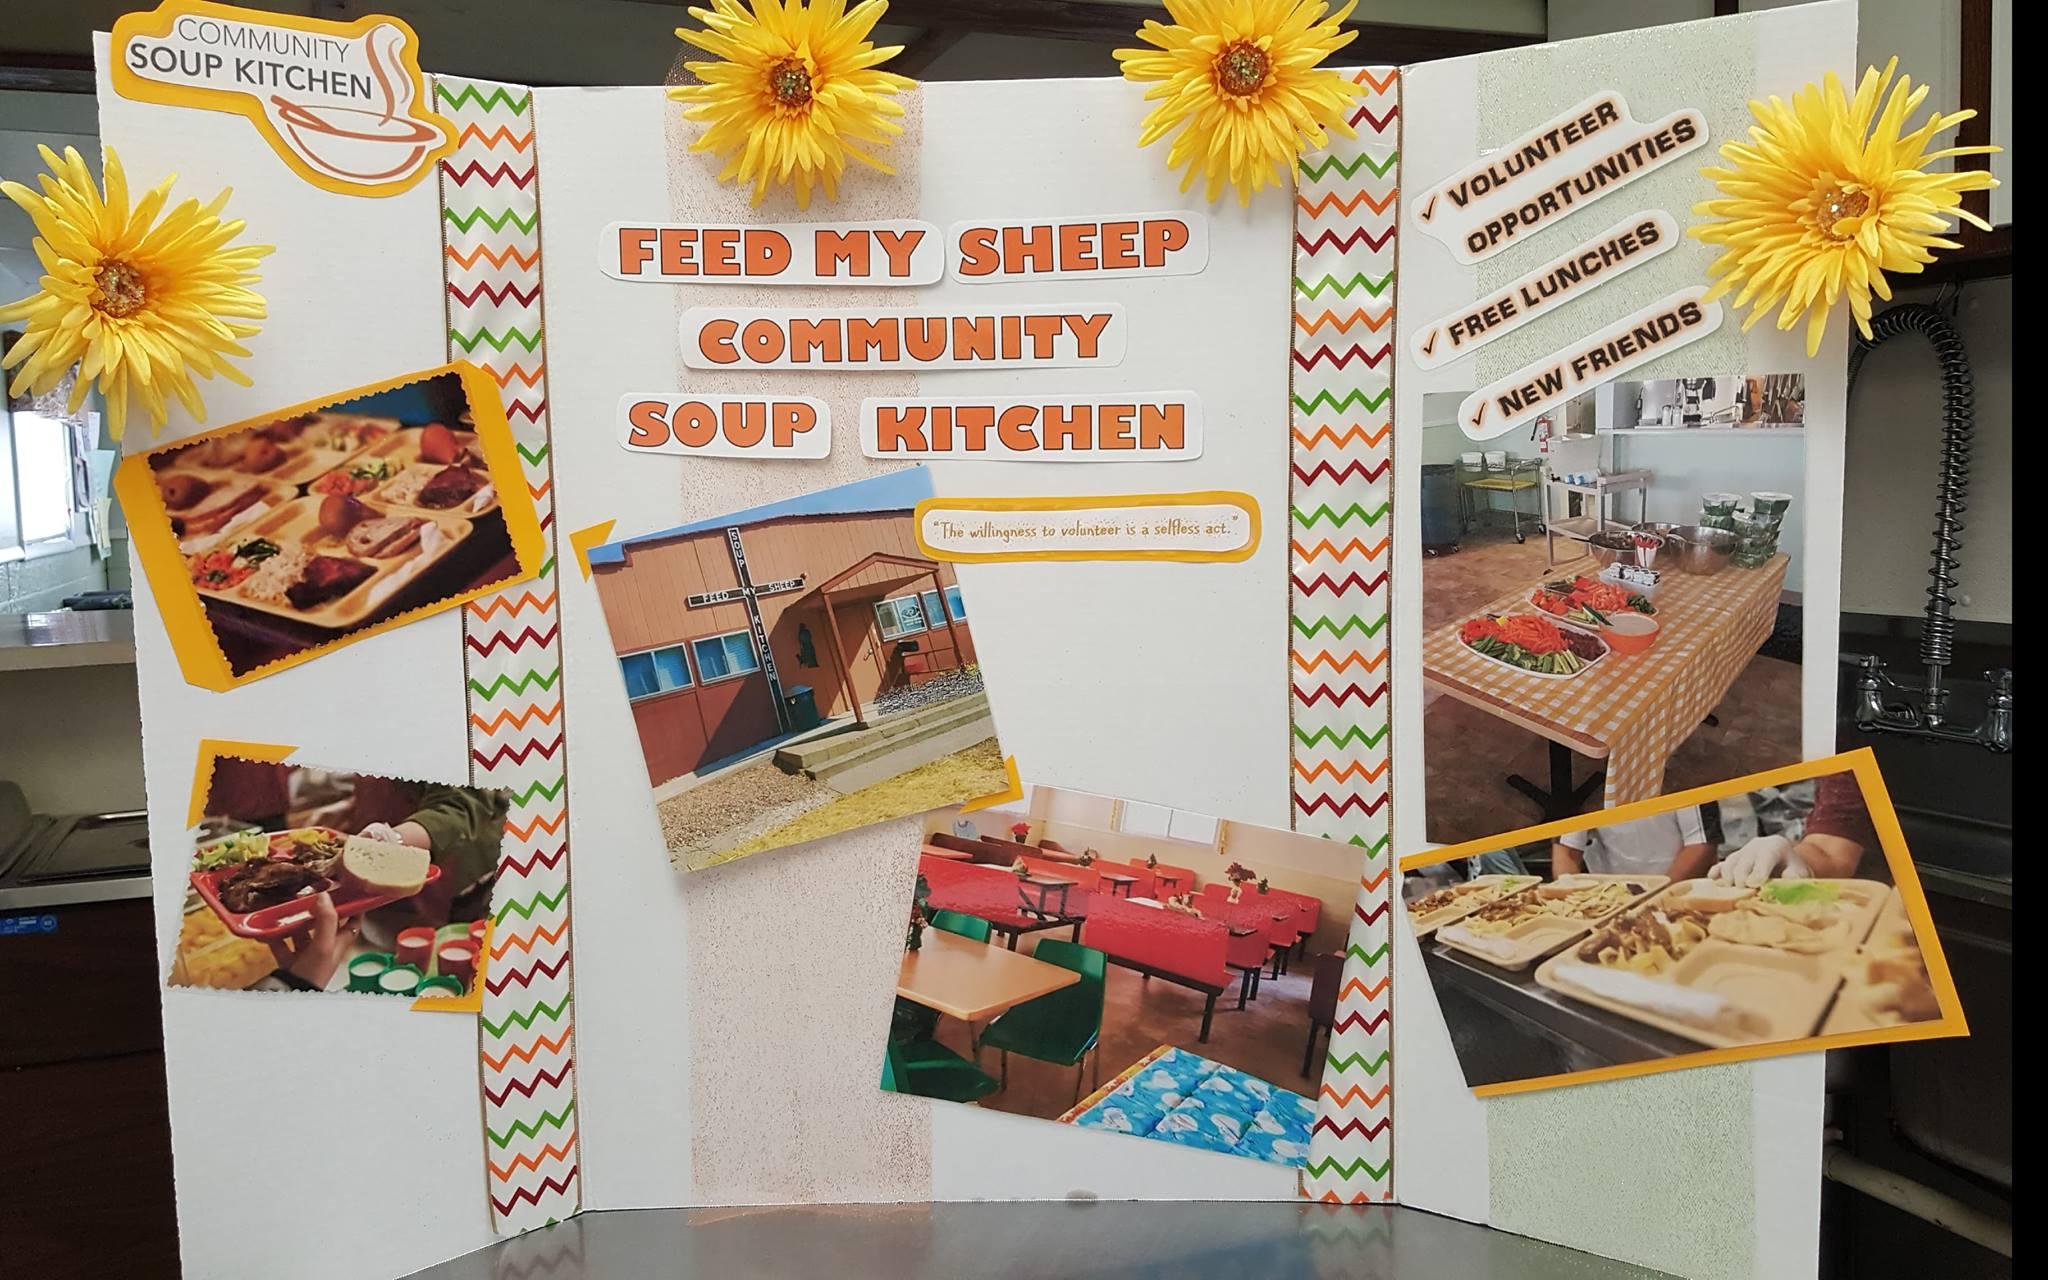 Feed My Sheep Community Soup Kitchen